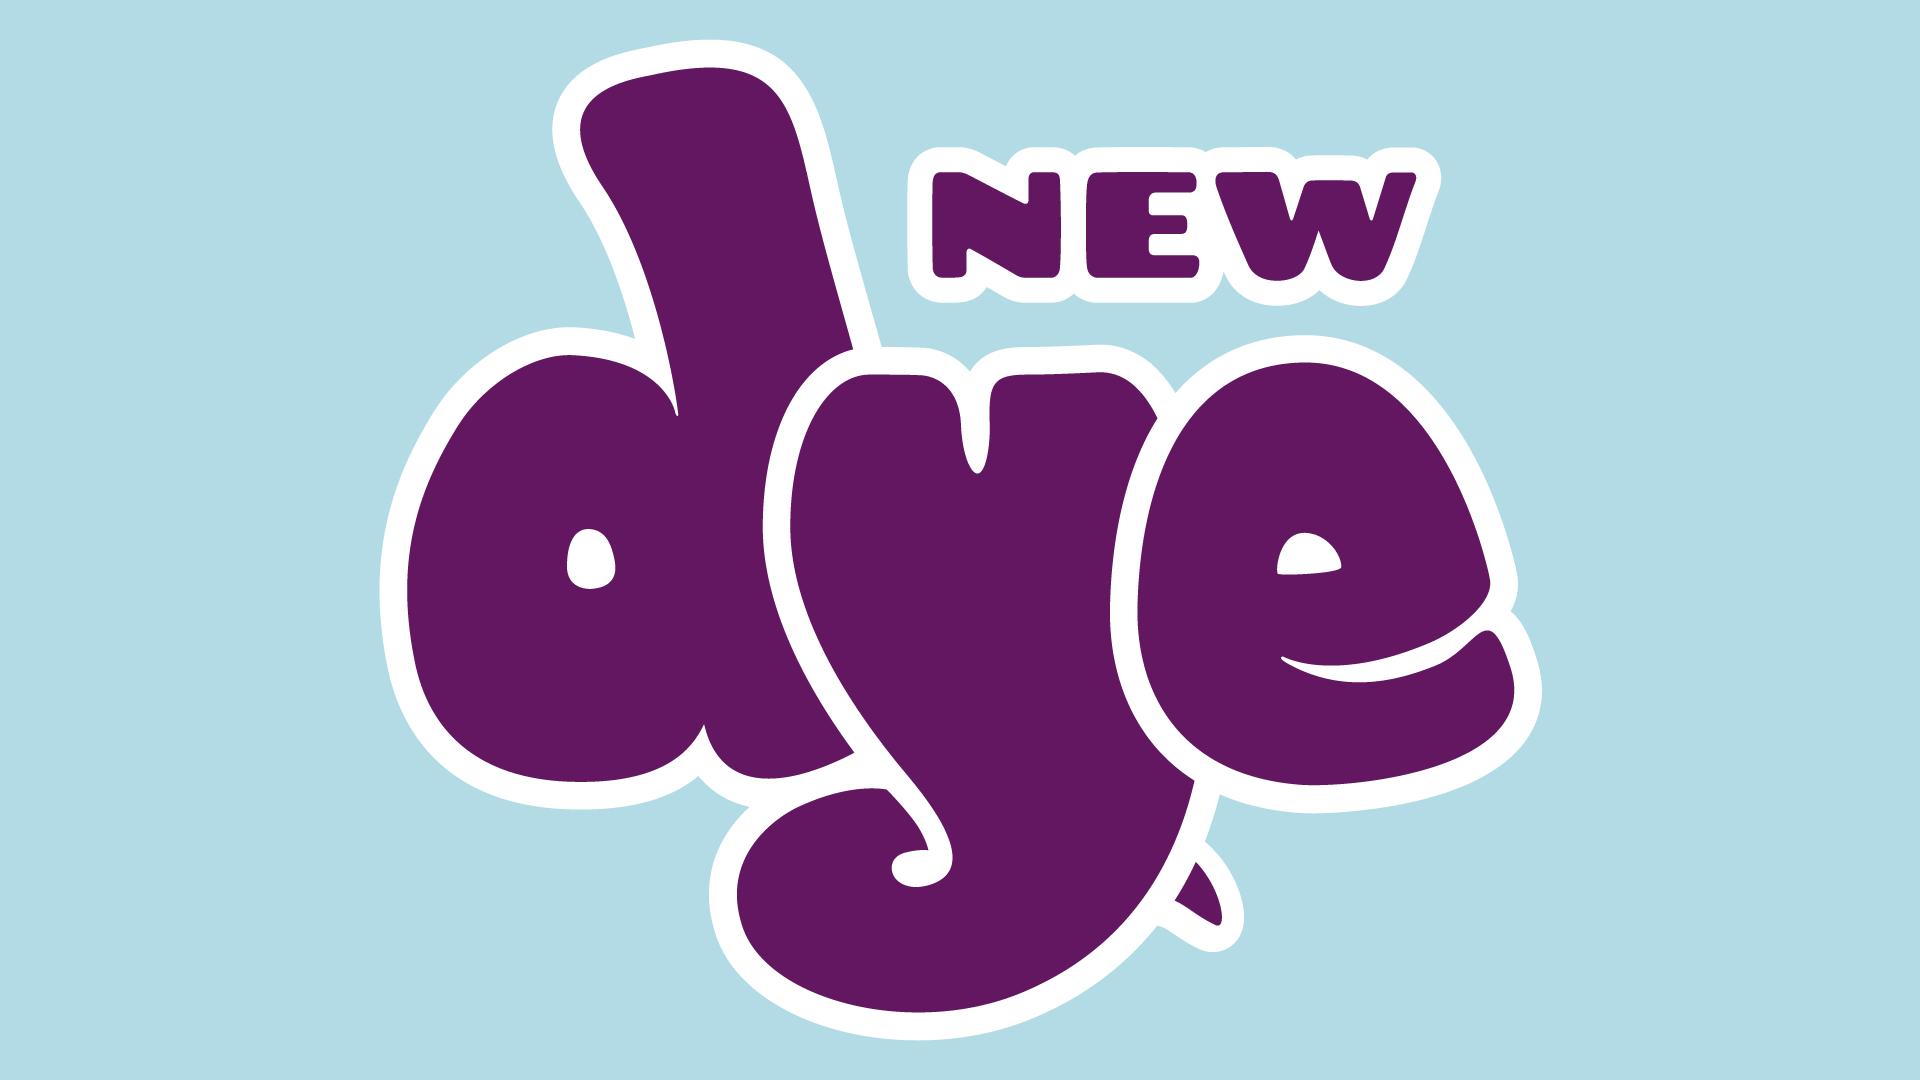 New Dye Handcrafted Tie-Dye Garments & Housewares